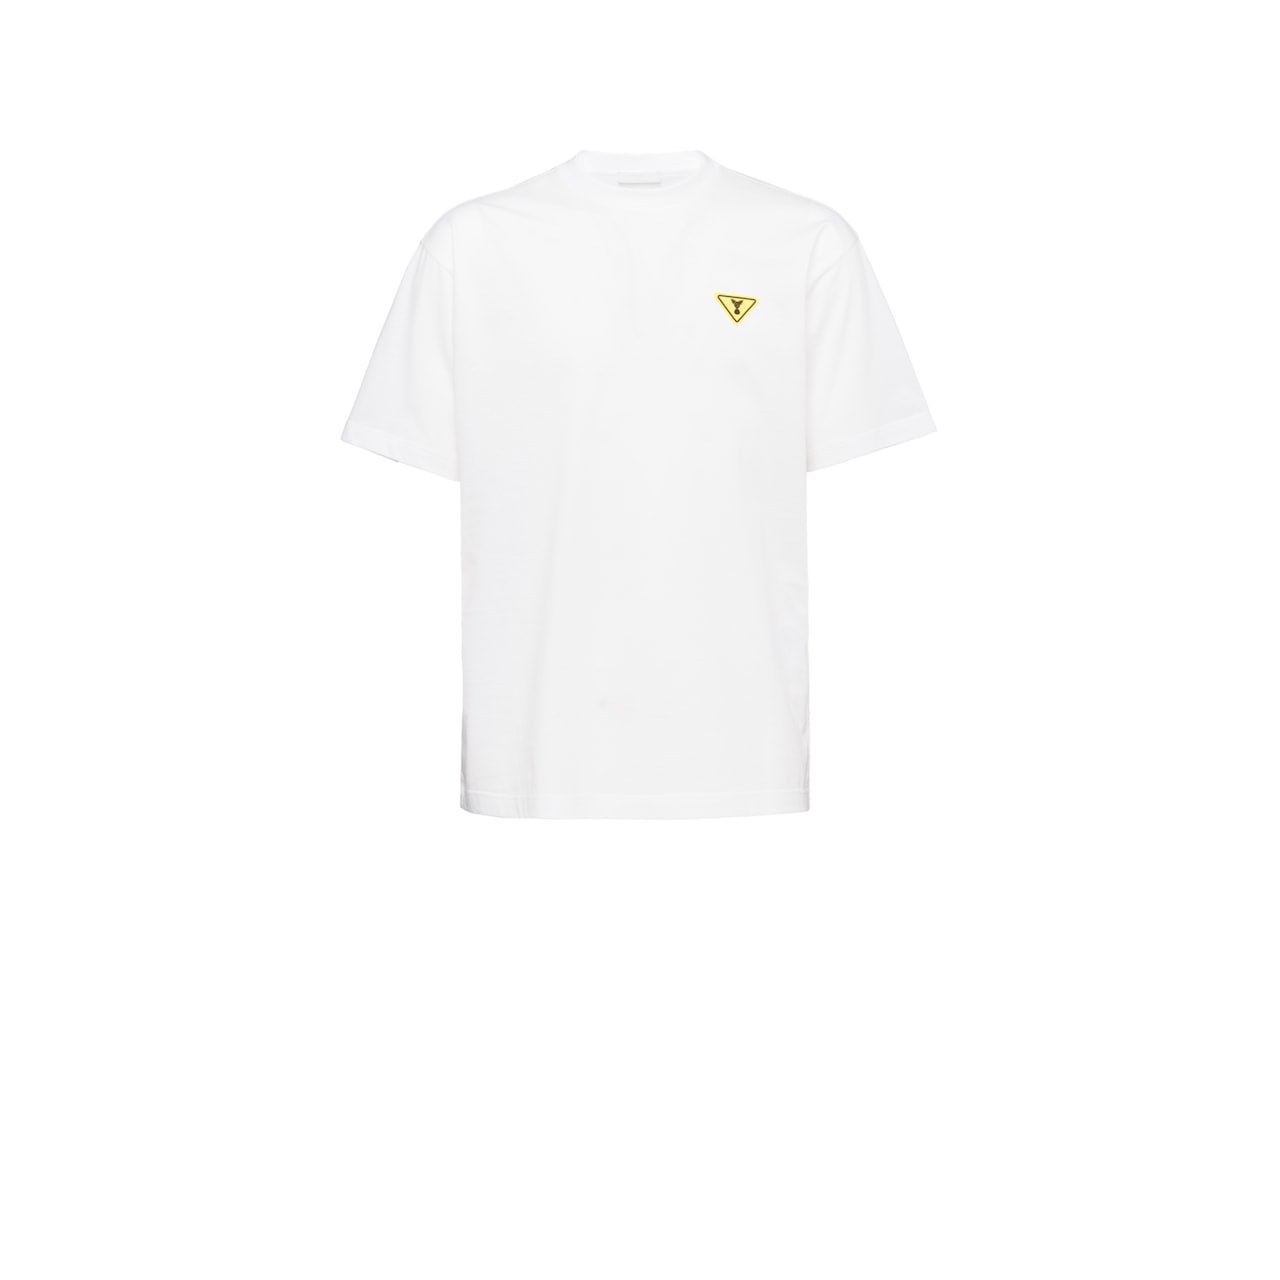 Pradamalia cotton T-shirt